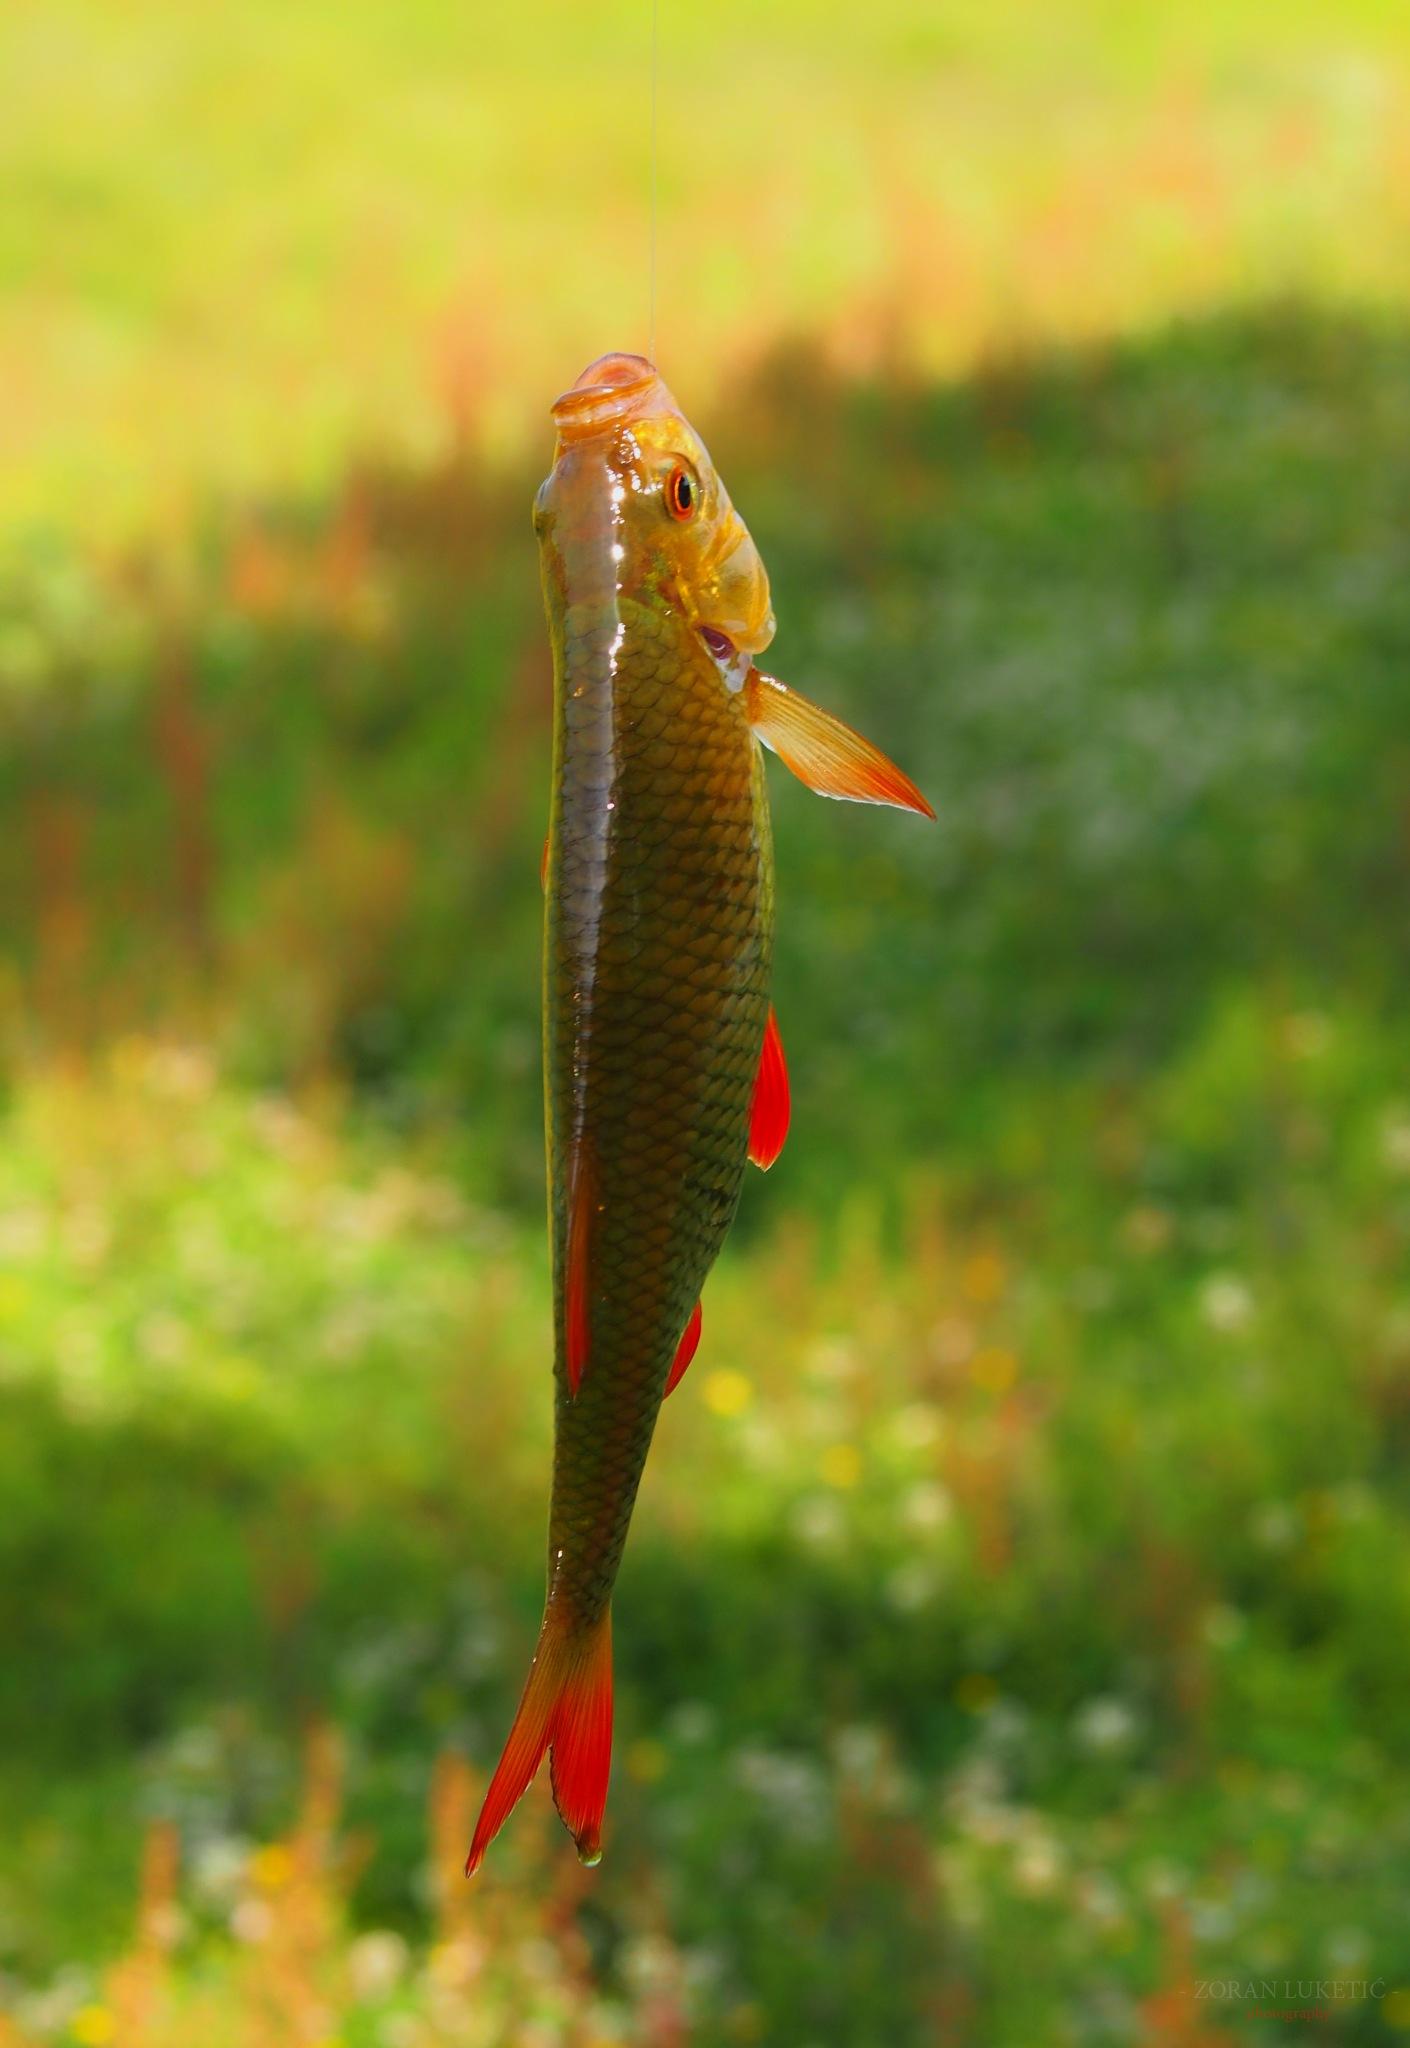 Fishing by zoki